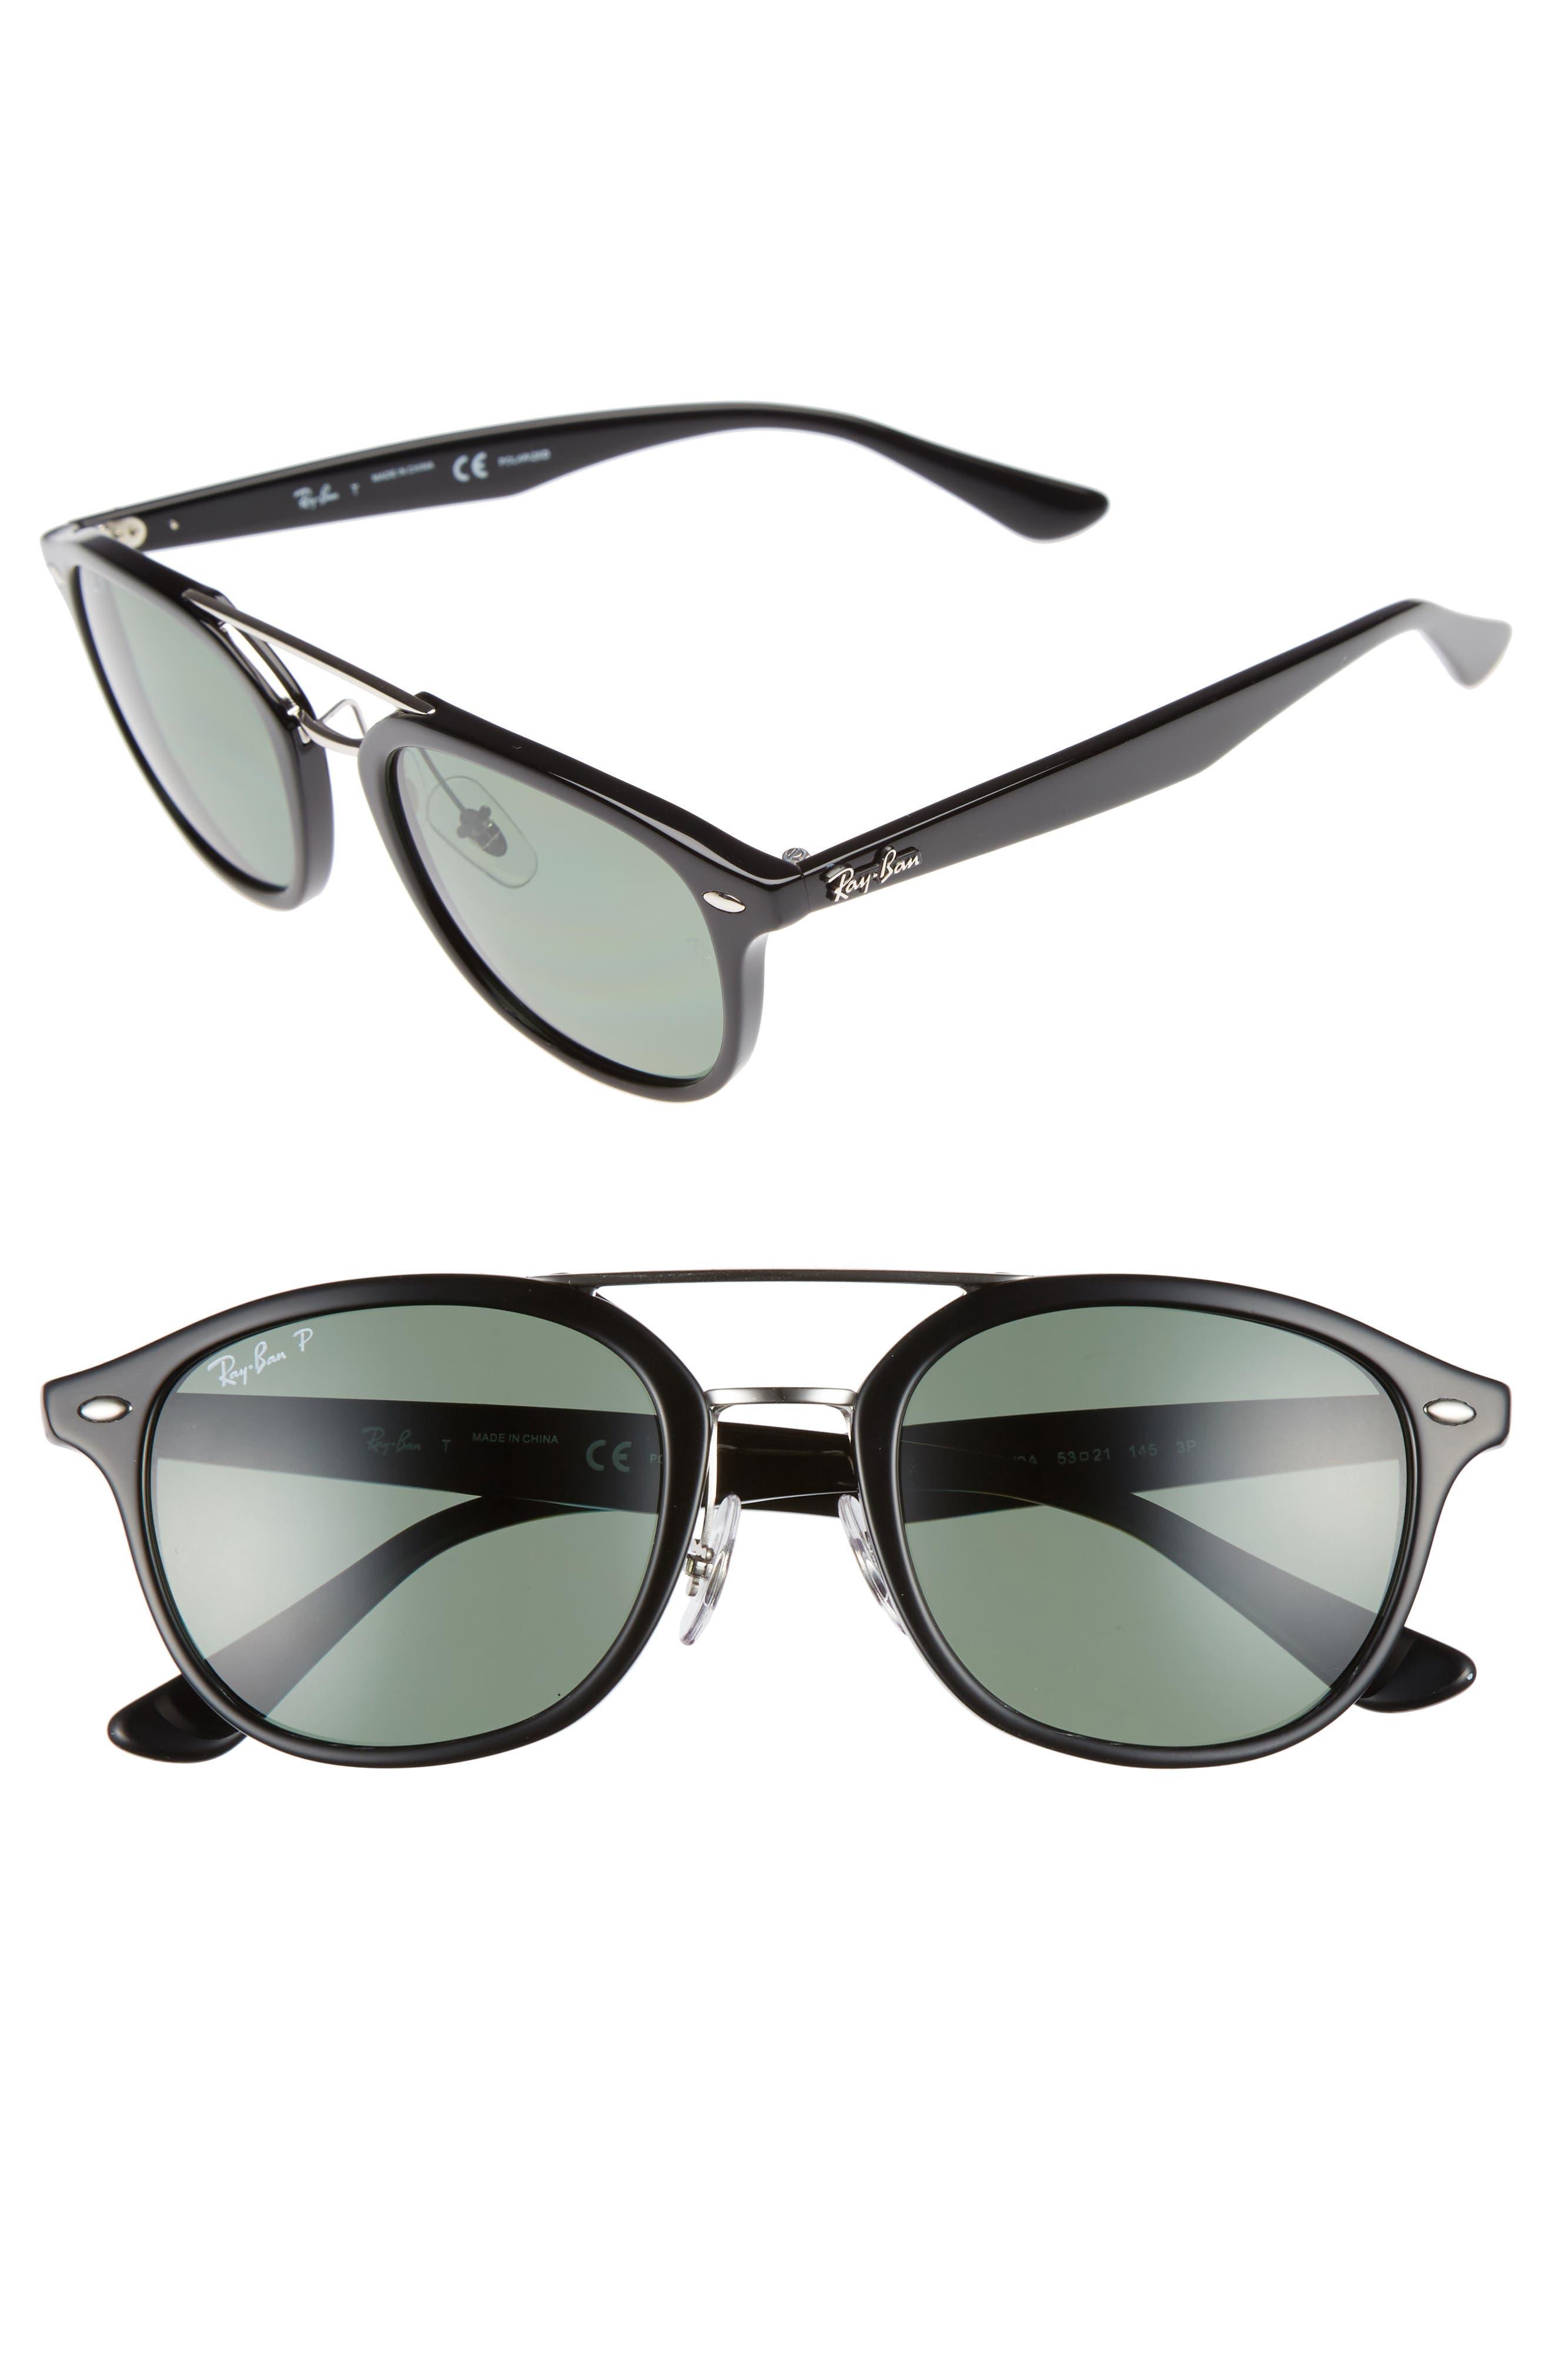 Ray-Ban 53mm Polarized Sunglasses